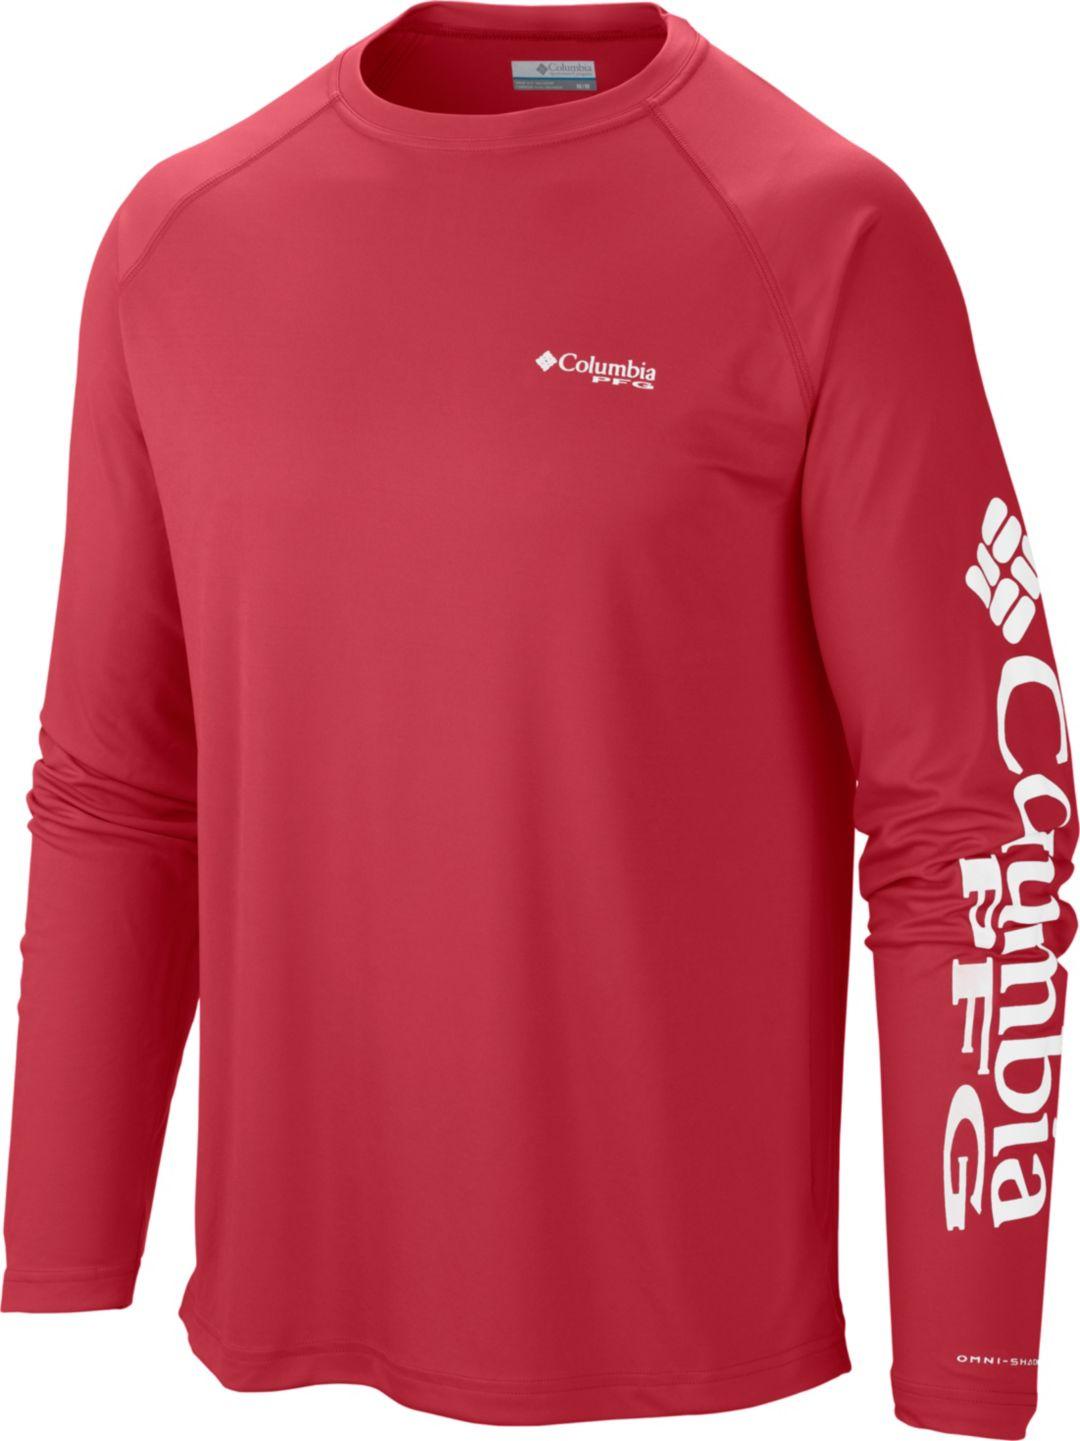 6b5c45ef Columbia Men's PFG Terminal Tackle Long Sleeve Shirt - Tall | DICK'S ...